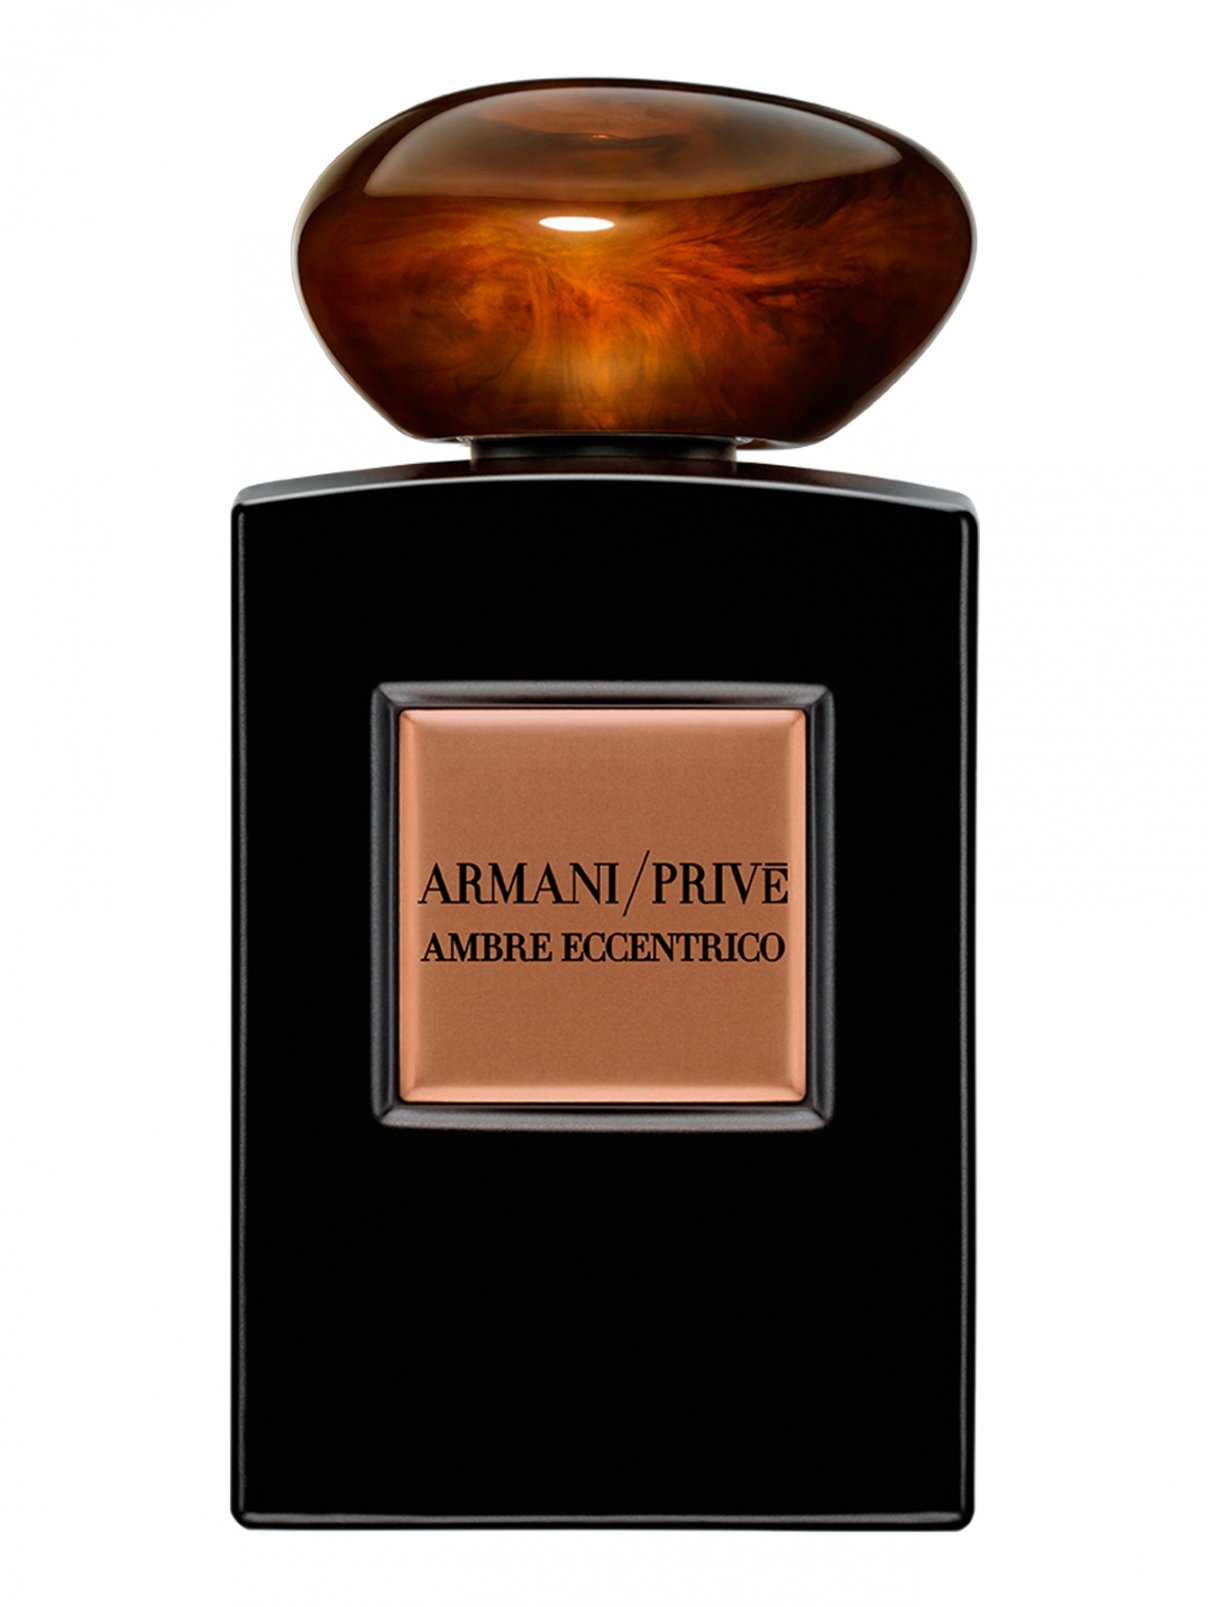 Парфюмерная Вода - Ambre Eccentrico, 100ml Giorgio Armani  –  Общий вид